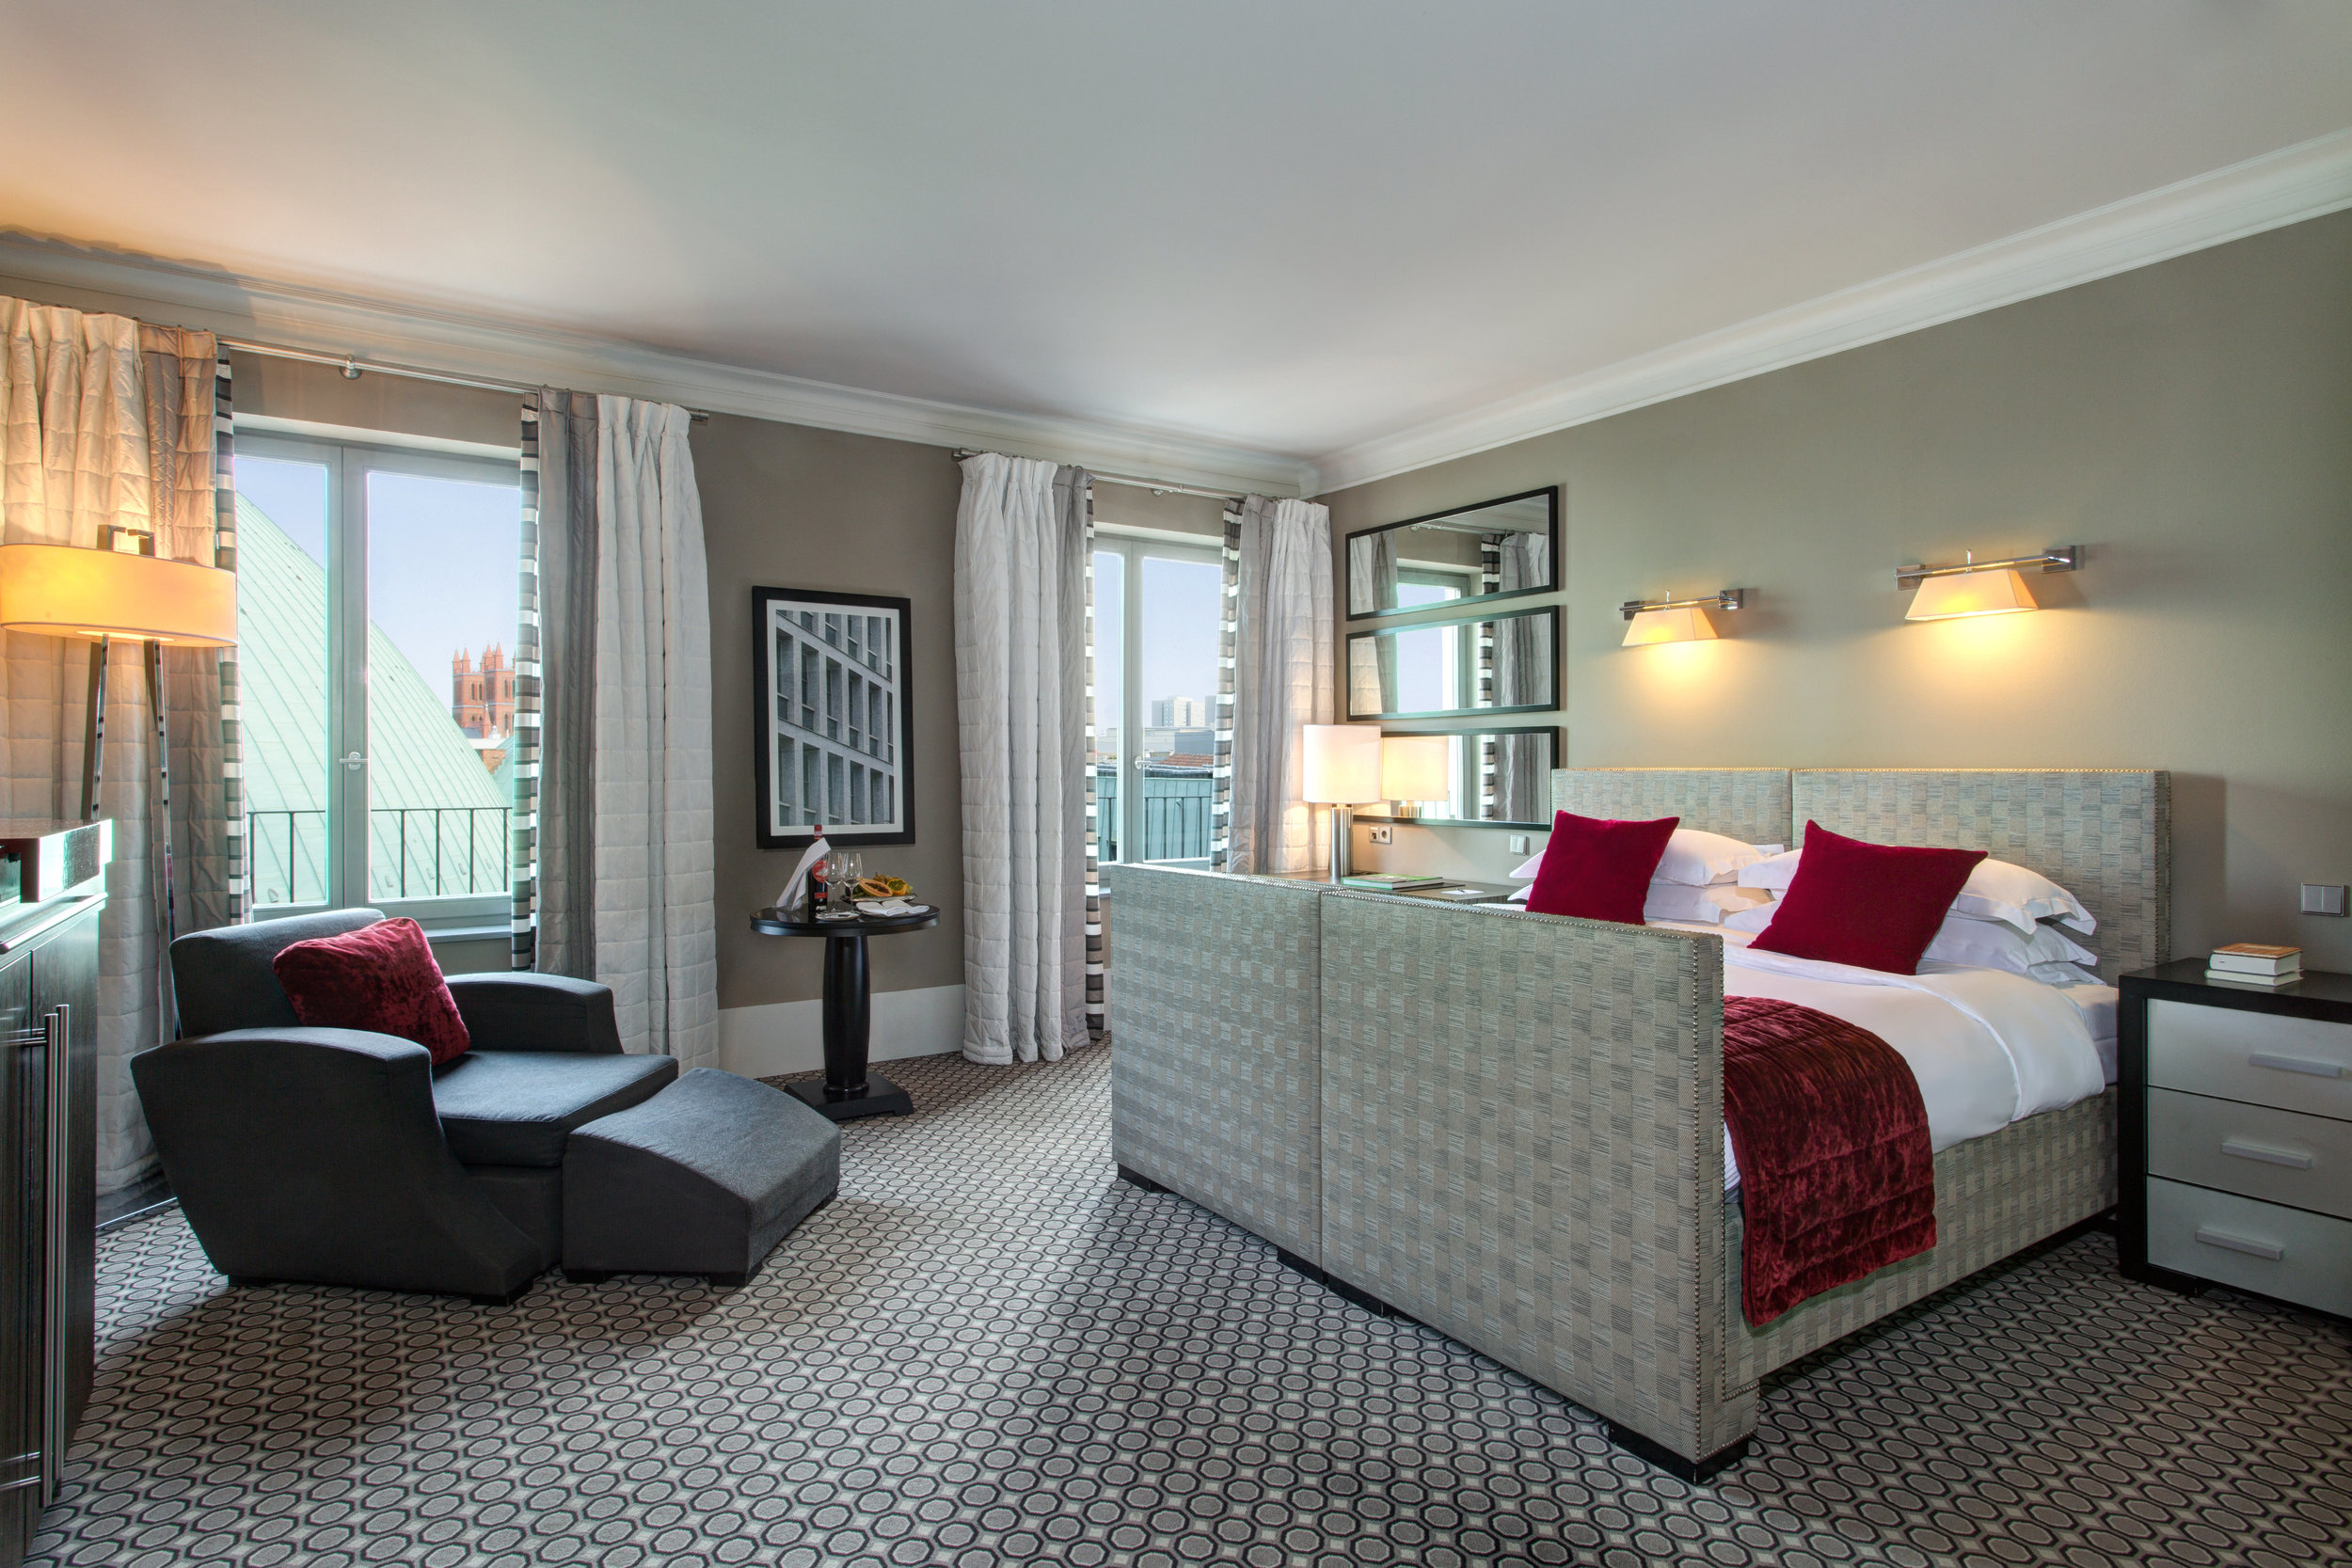 10 RFH Hotel de Rome - Superior Deluxe Room.jpg